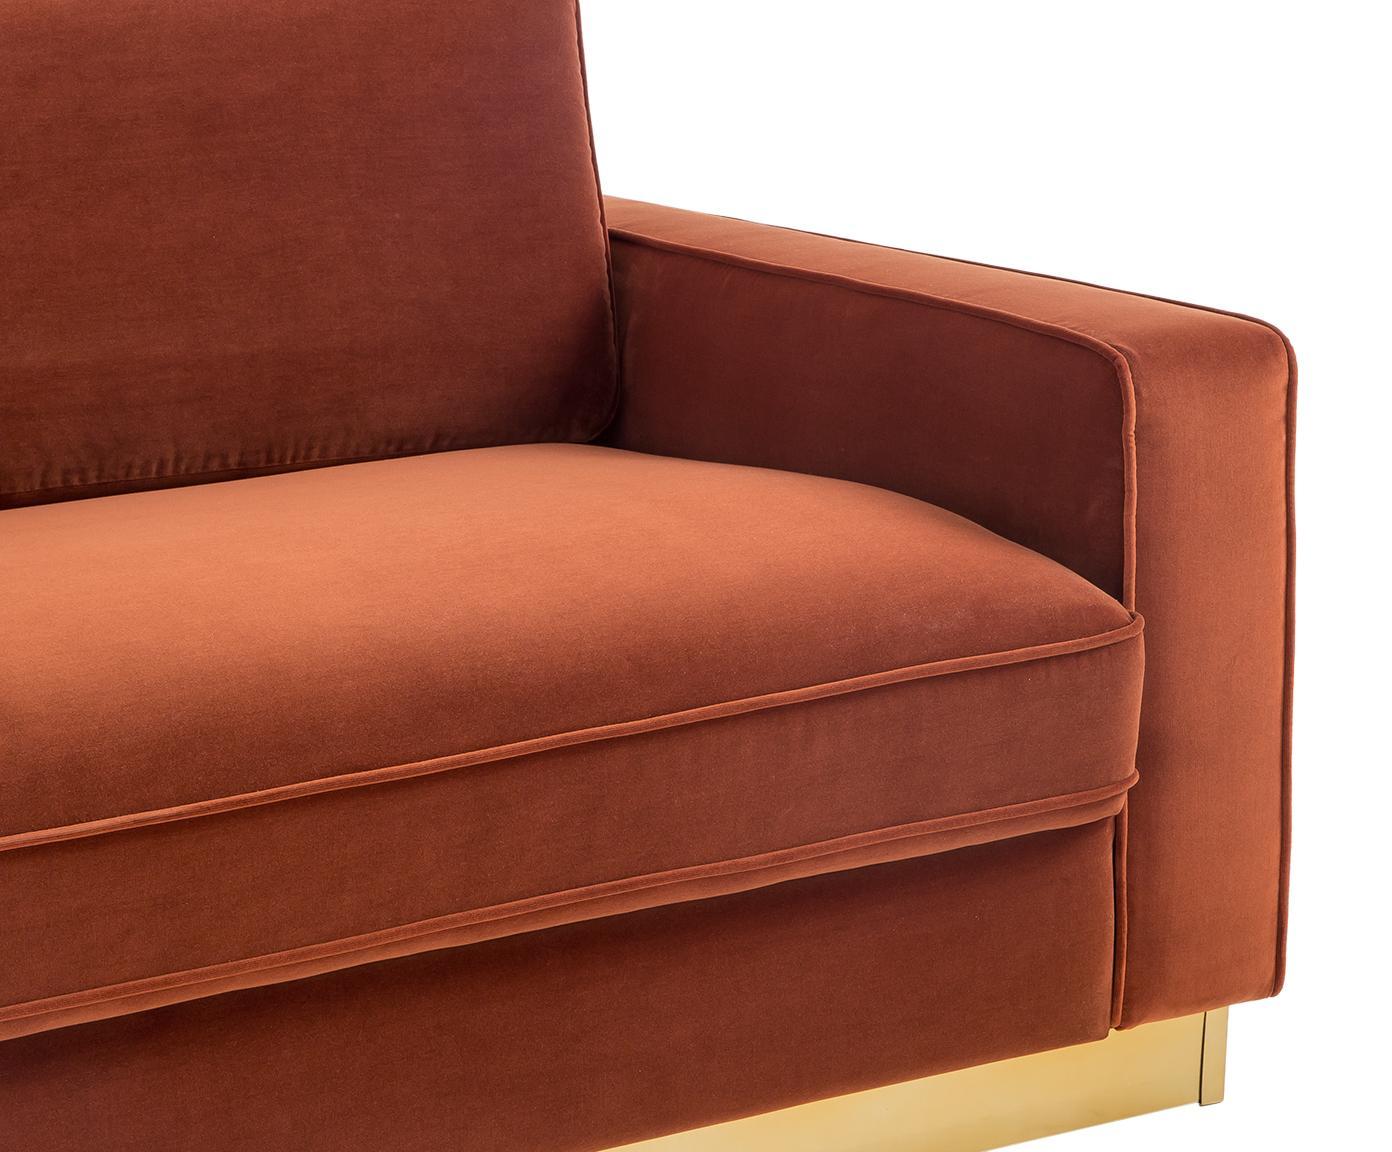 Fluwelen bank Chelsea (3-zits), Bekleding: fluweel (hoogwaardig poly, Frame: massief vurenhout, Frame: gecoat metaal, Roestrood, B 228 x D 100 cm